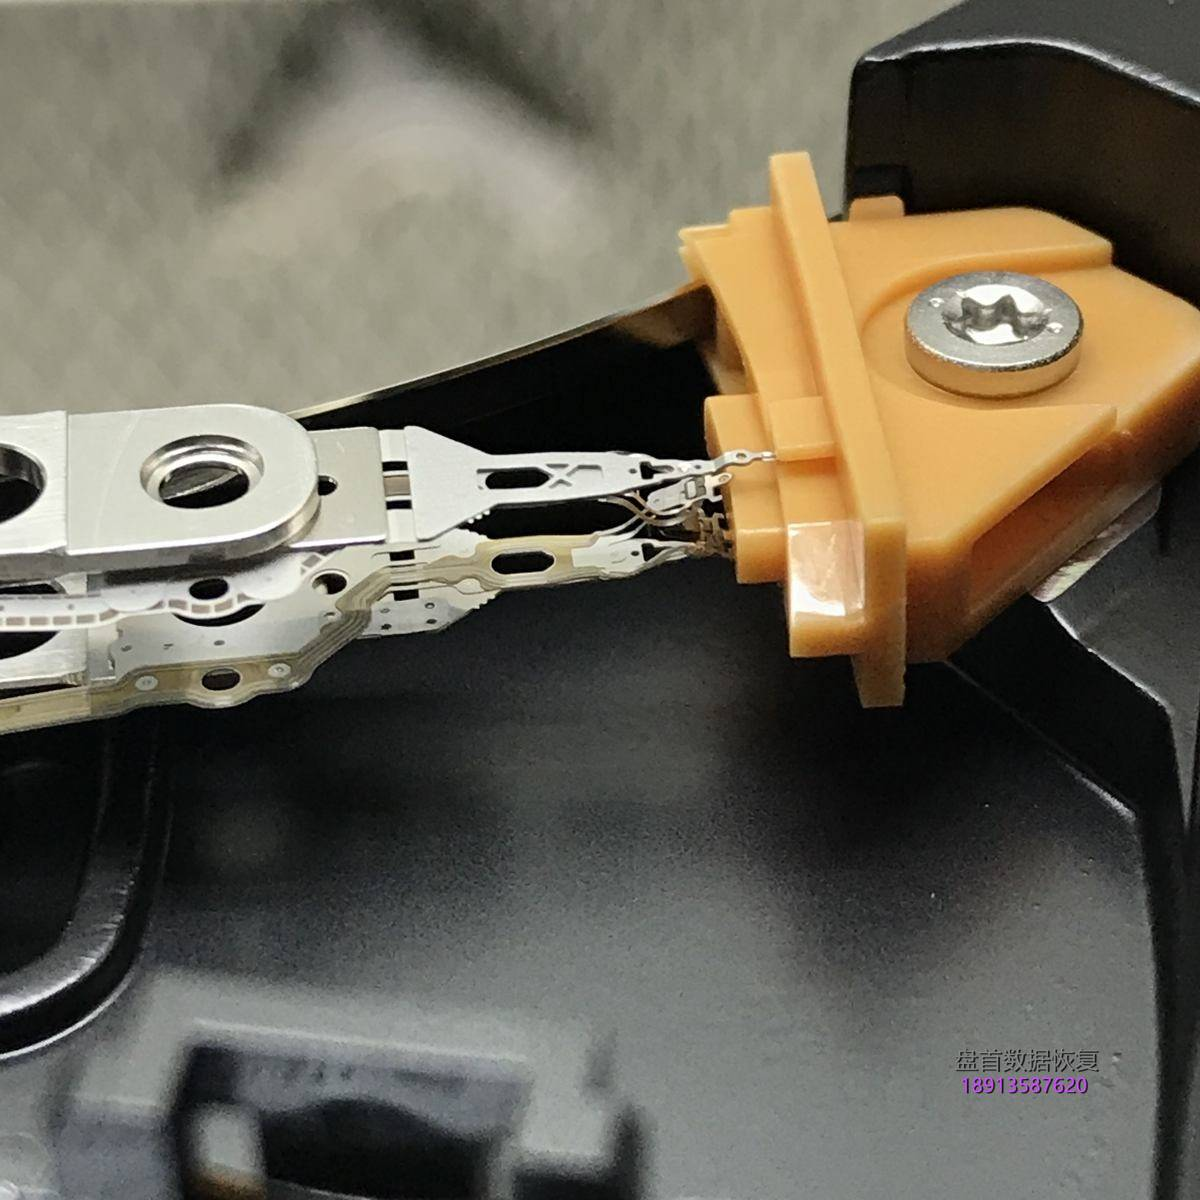 WD5000AAKX-001CA0硬盘磁头损坏敲盘异响